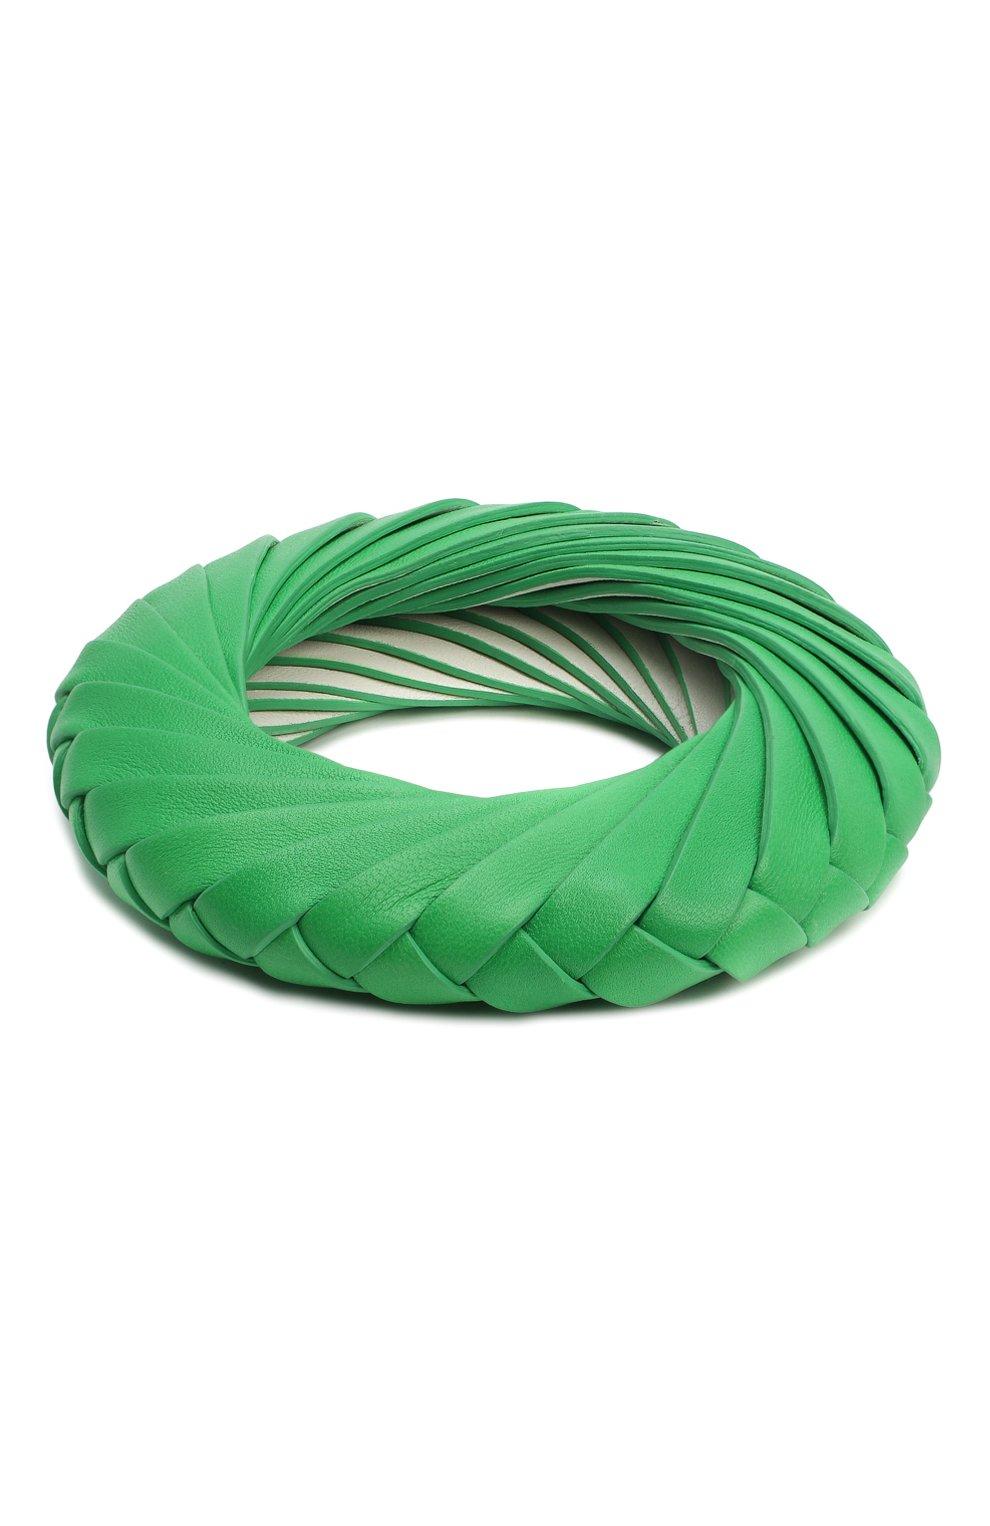 Женский браслет BOTTEGA VENETA зеленого цвета, арт. 629376/V0050 | Фото 2